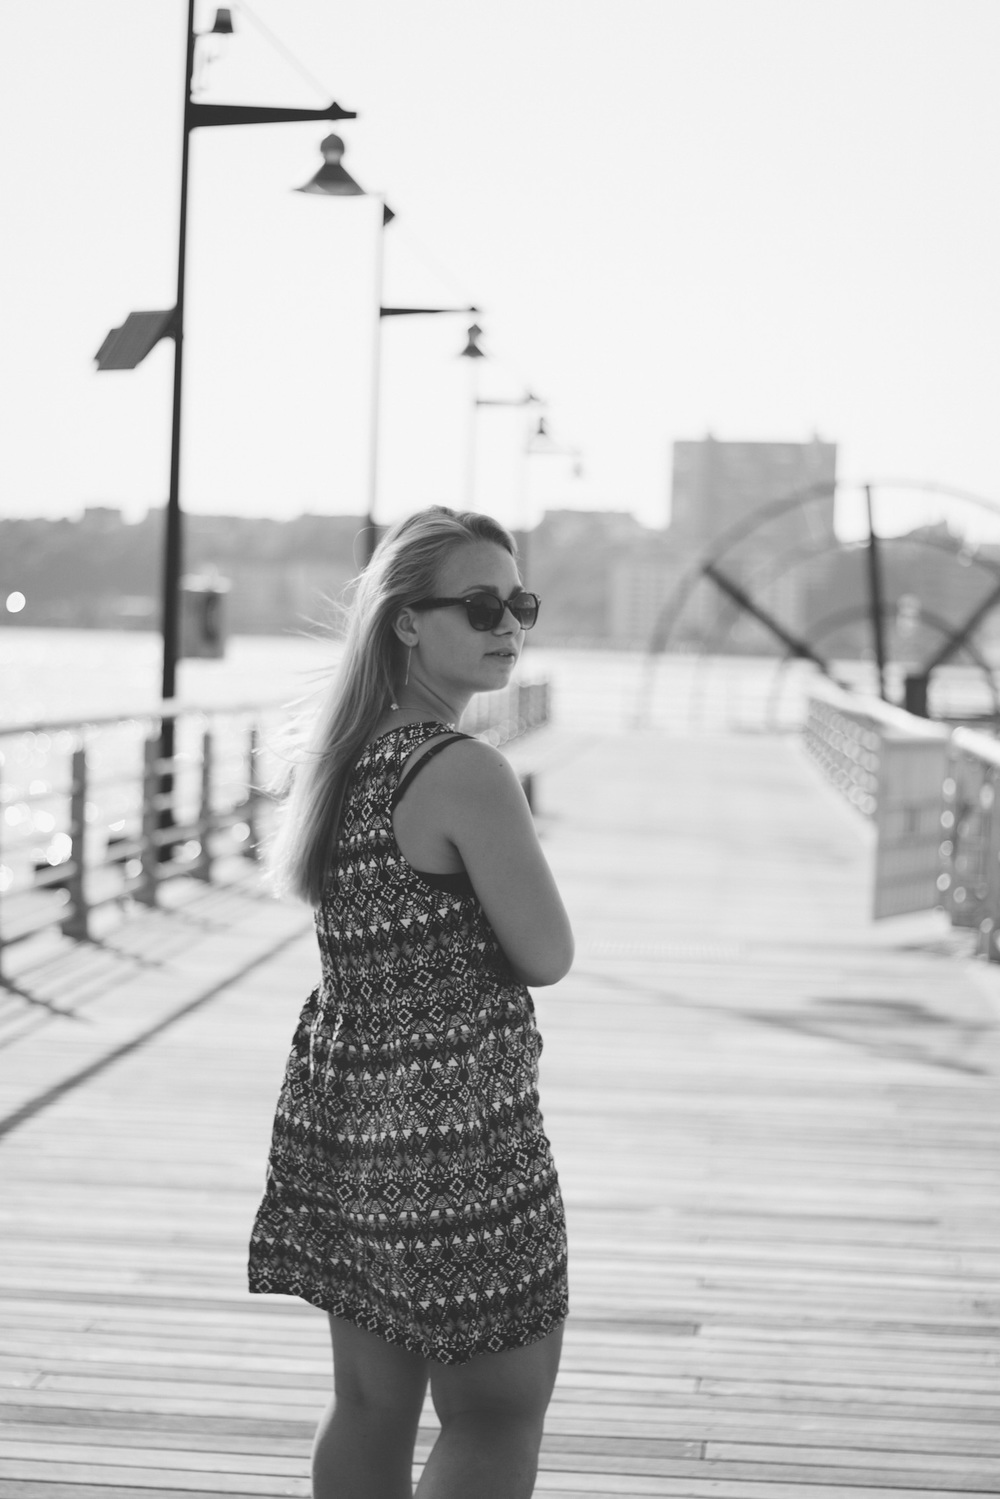 anya hudson river park pier portrait new york nyc korrelat walksmilesnap 2.jpg